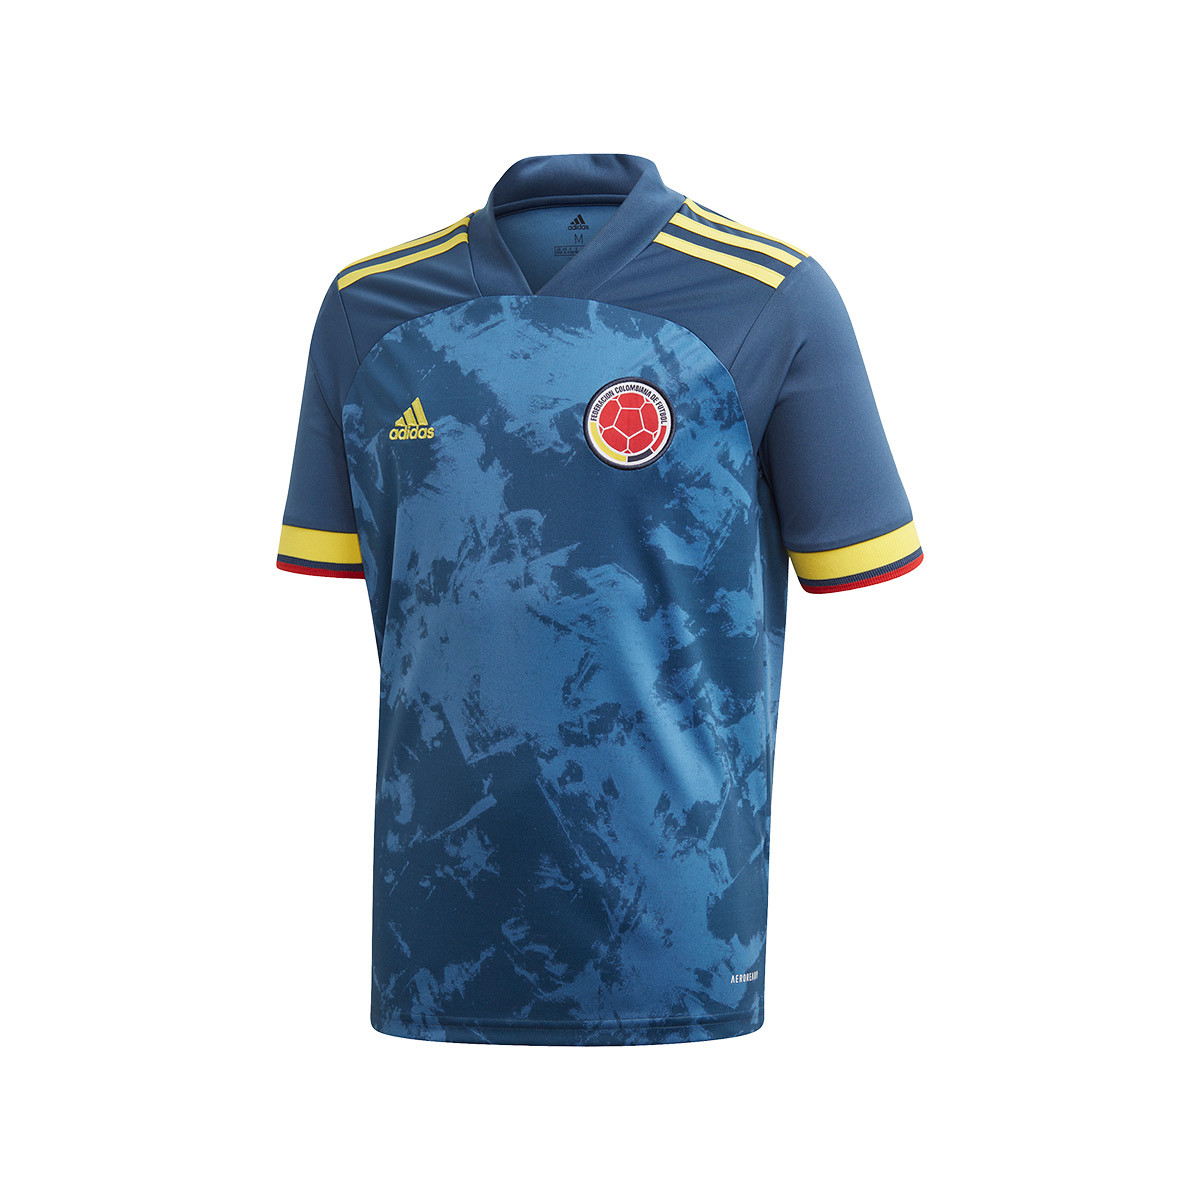 Camiseta adidas Colombia Segunda Equipación 2019 2020 Niño